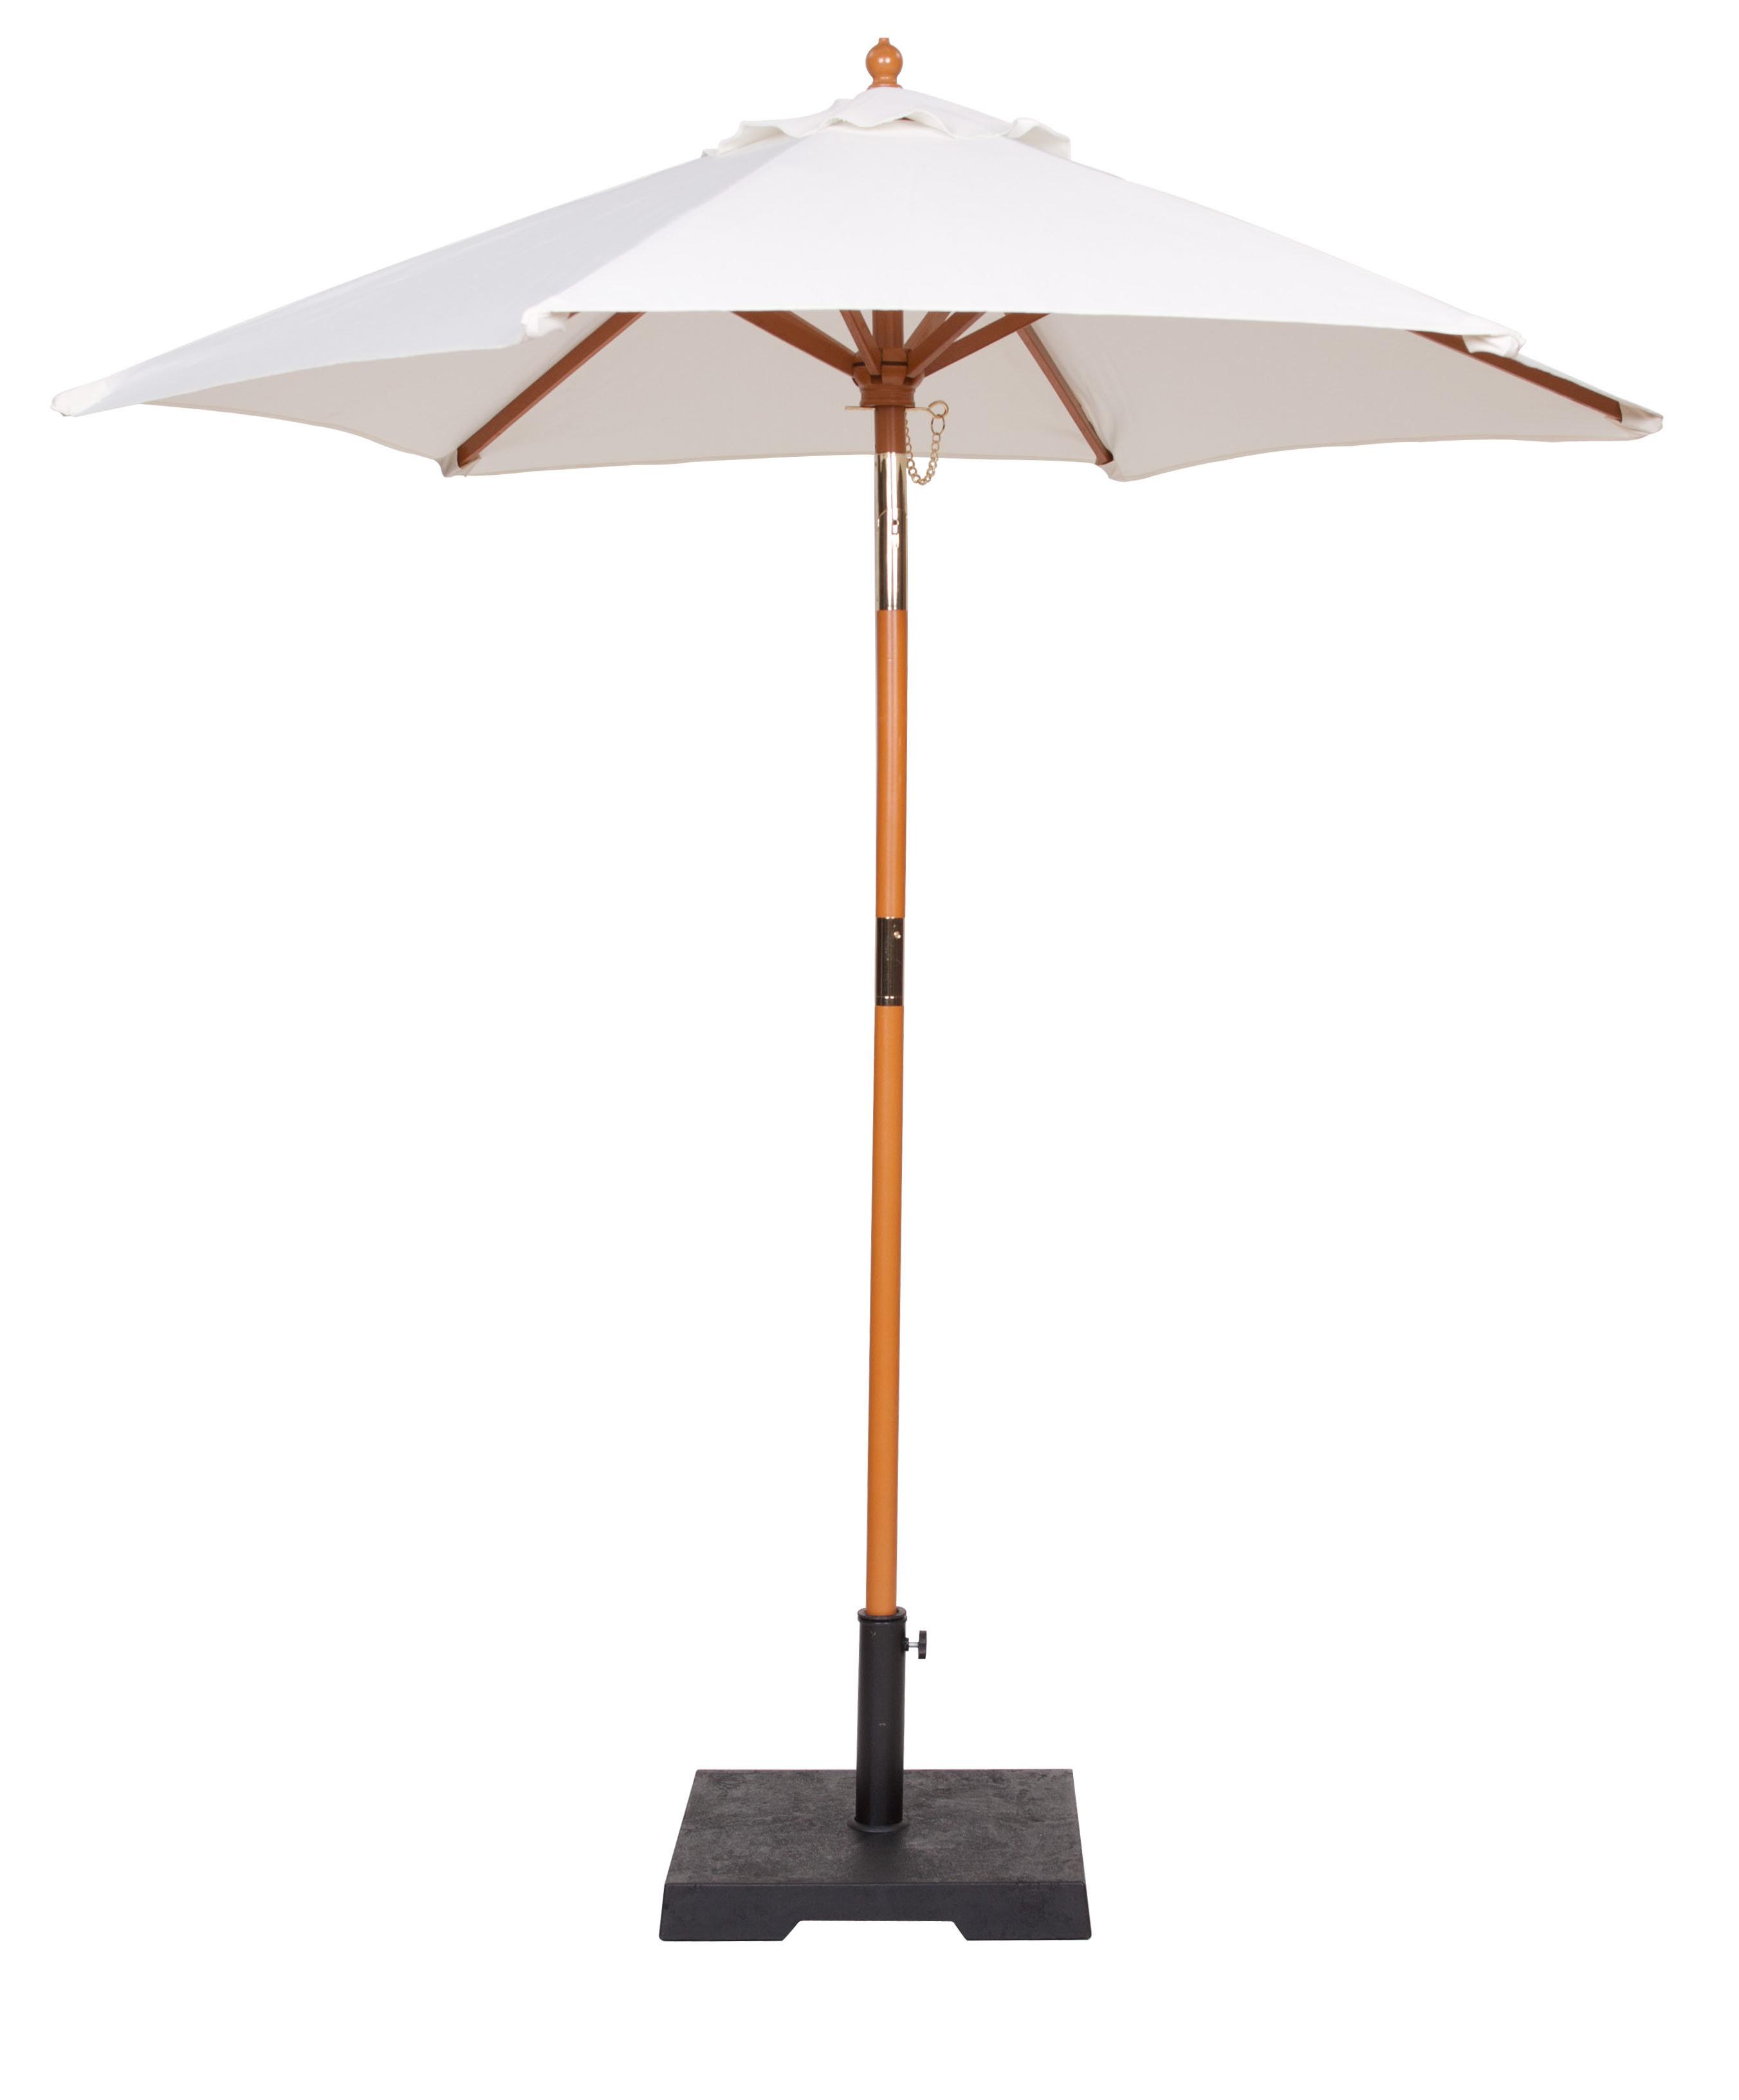 Shropshire Market Umbrella With Regard To 2020 Aldan Market Umbrellas (View 15 of 20)